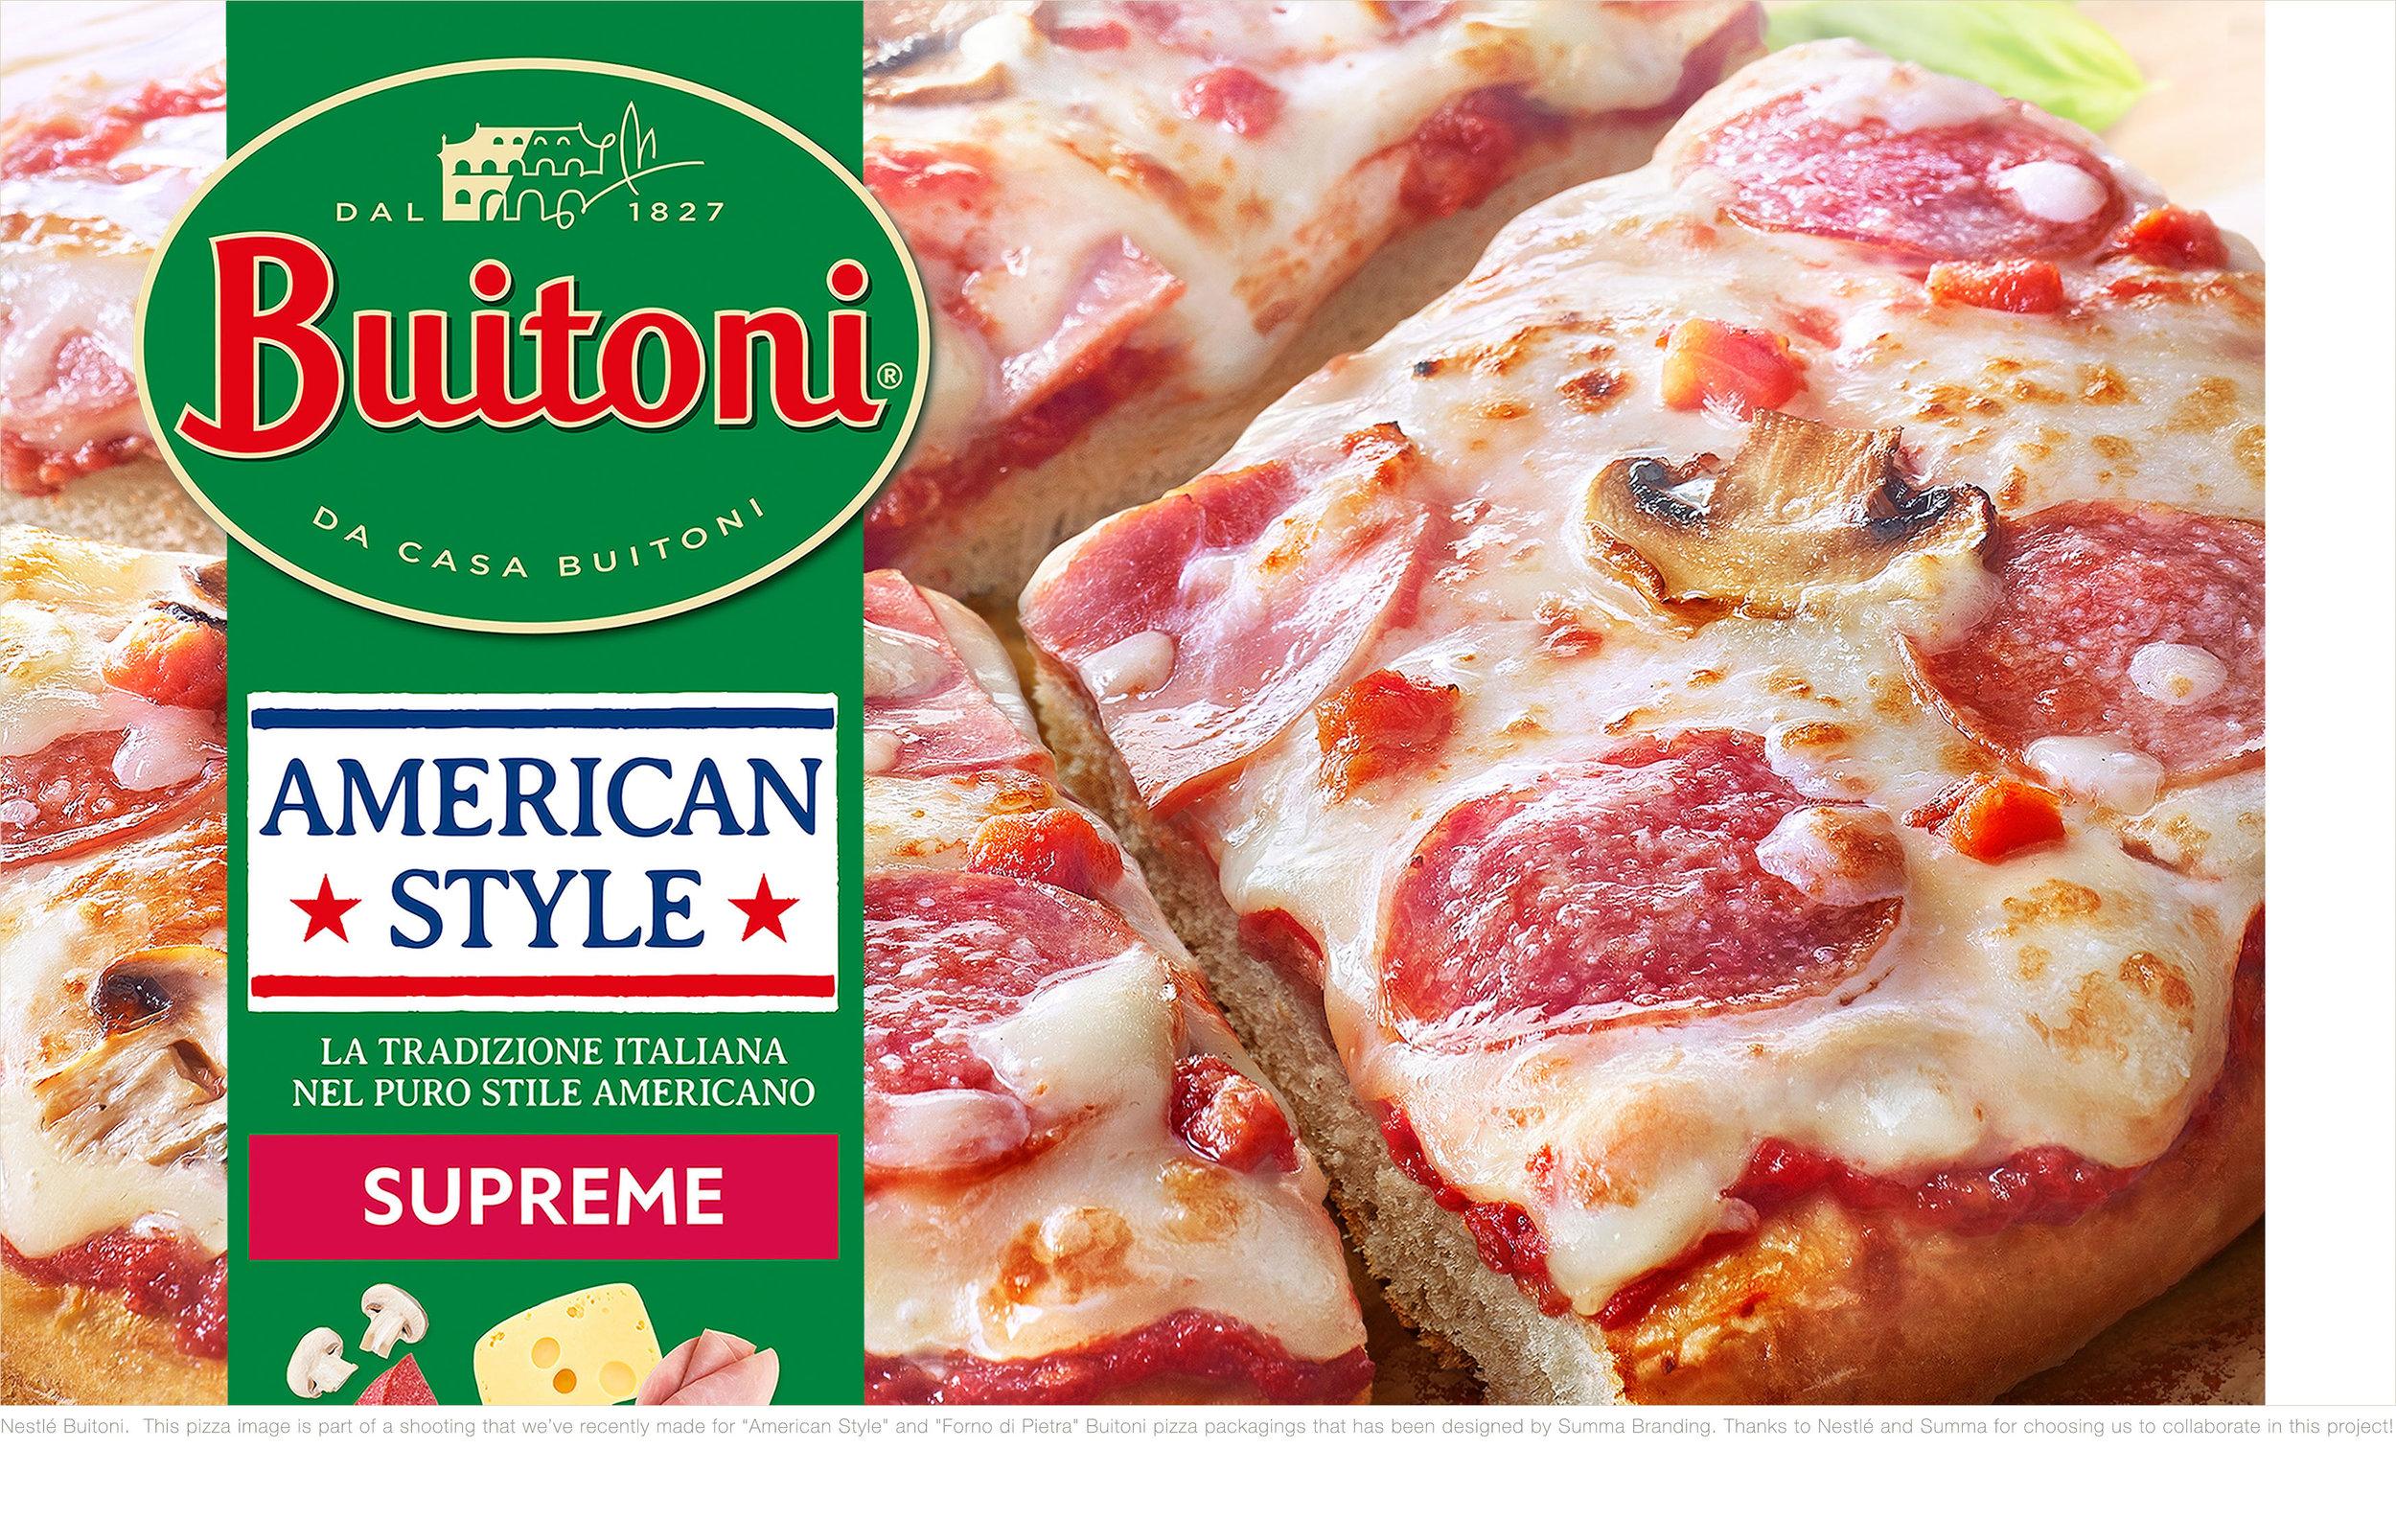 1834-Buitoni-Pizza-AmericanSupreme-v02.jpg